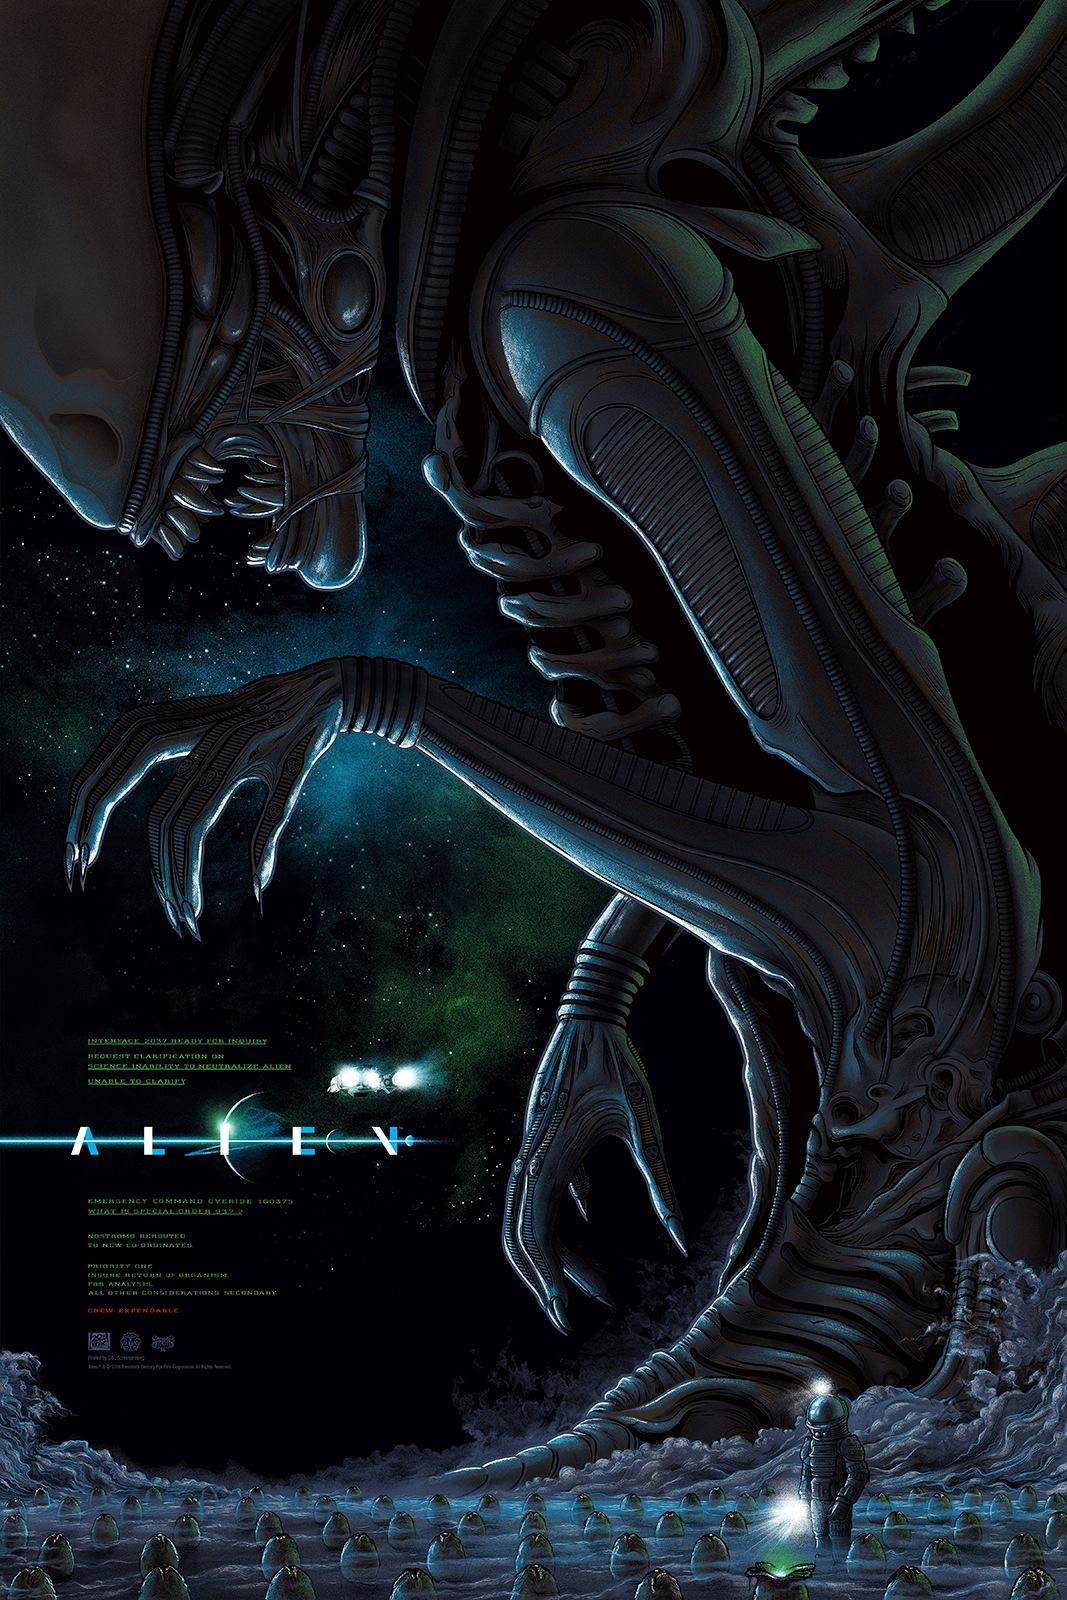 """Alien"" by Mike Saputo, Edition of 225 (Regular), 24""x36"" Screen Print, Printed by D&L Screenprinting: $45"